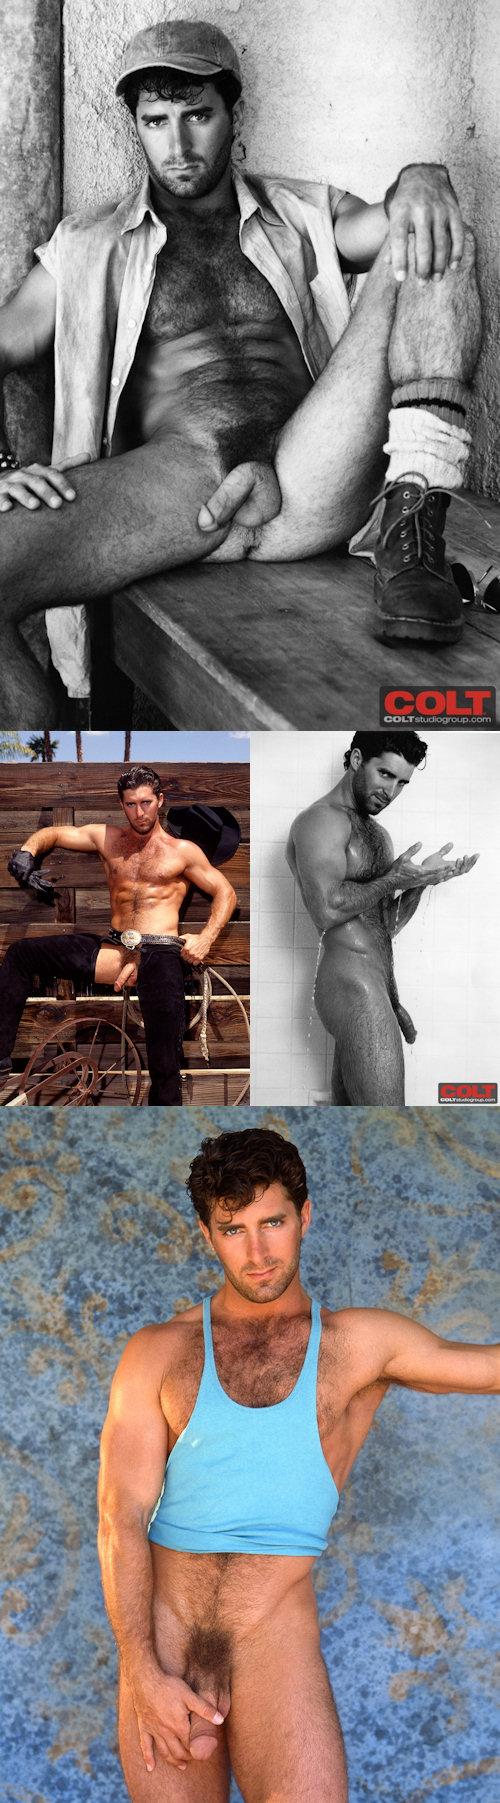 colt0120b.jpg